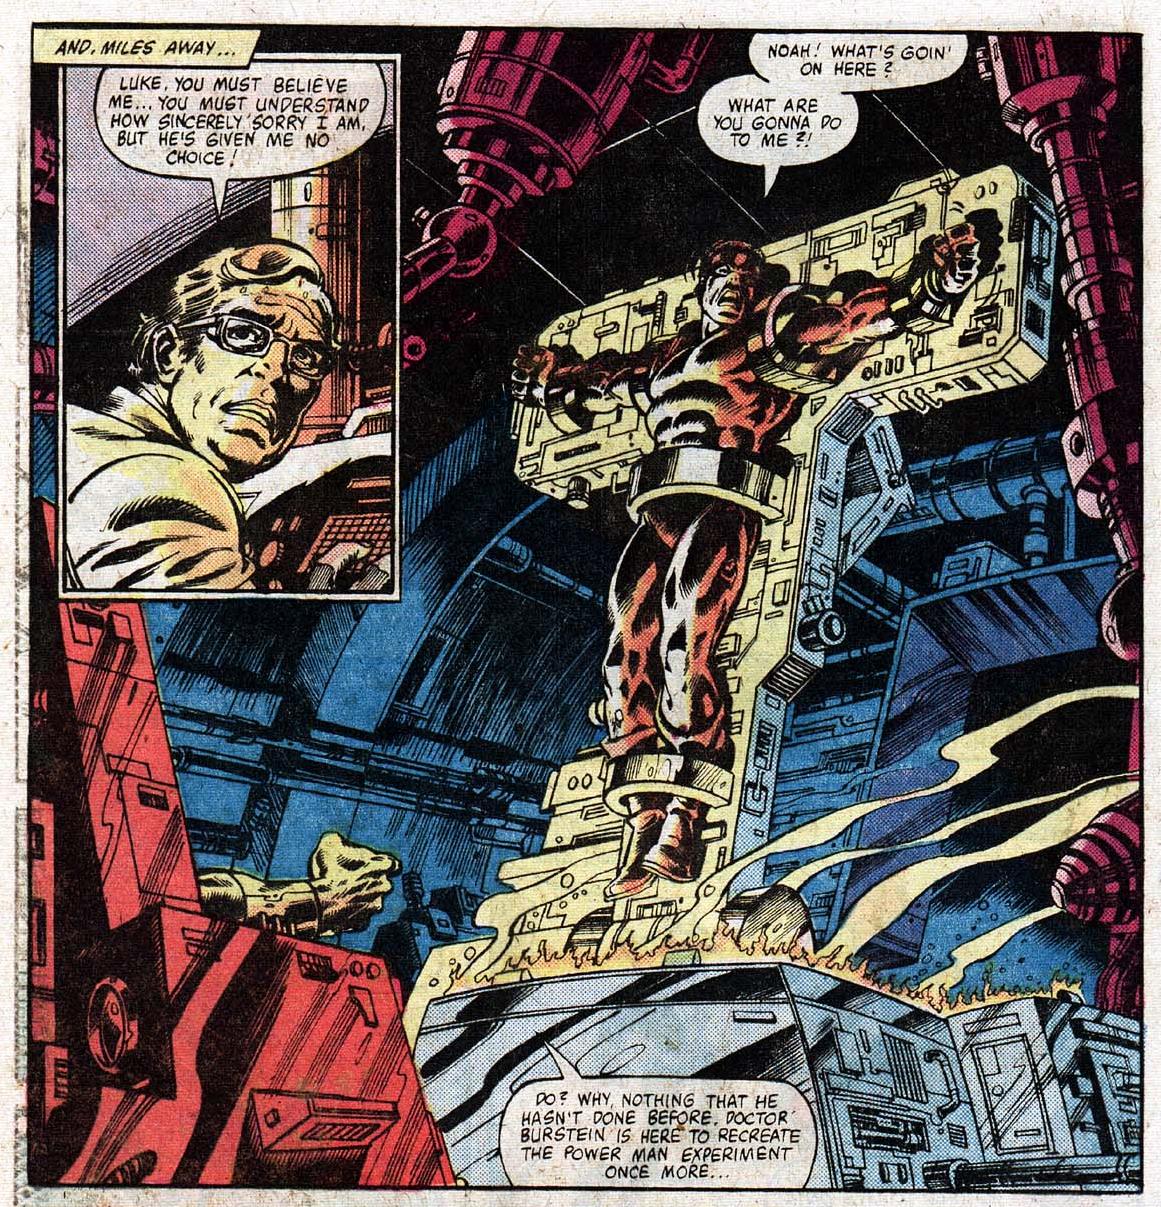 Who is Bushmaster in Marvel Comics? - Quora